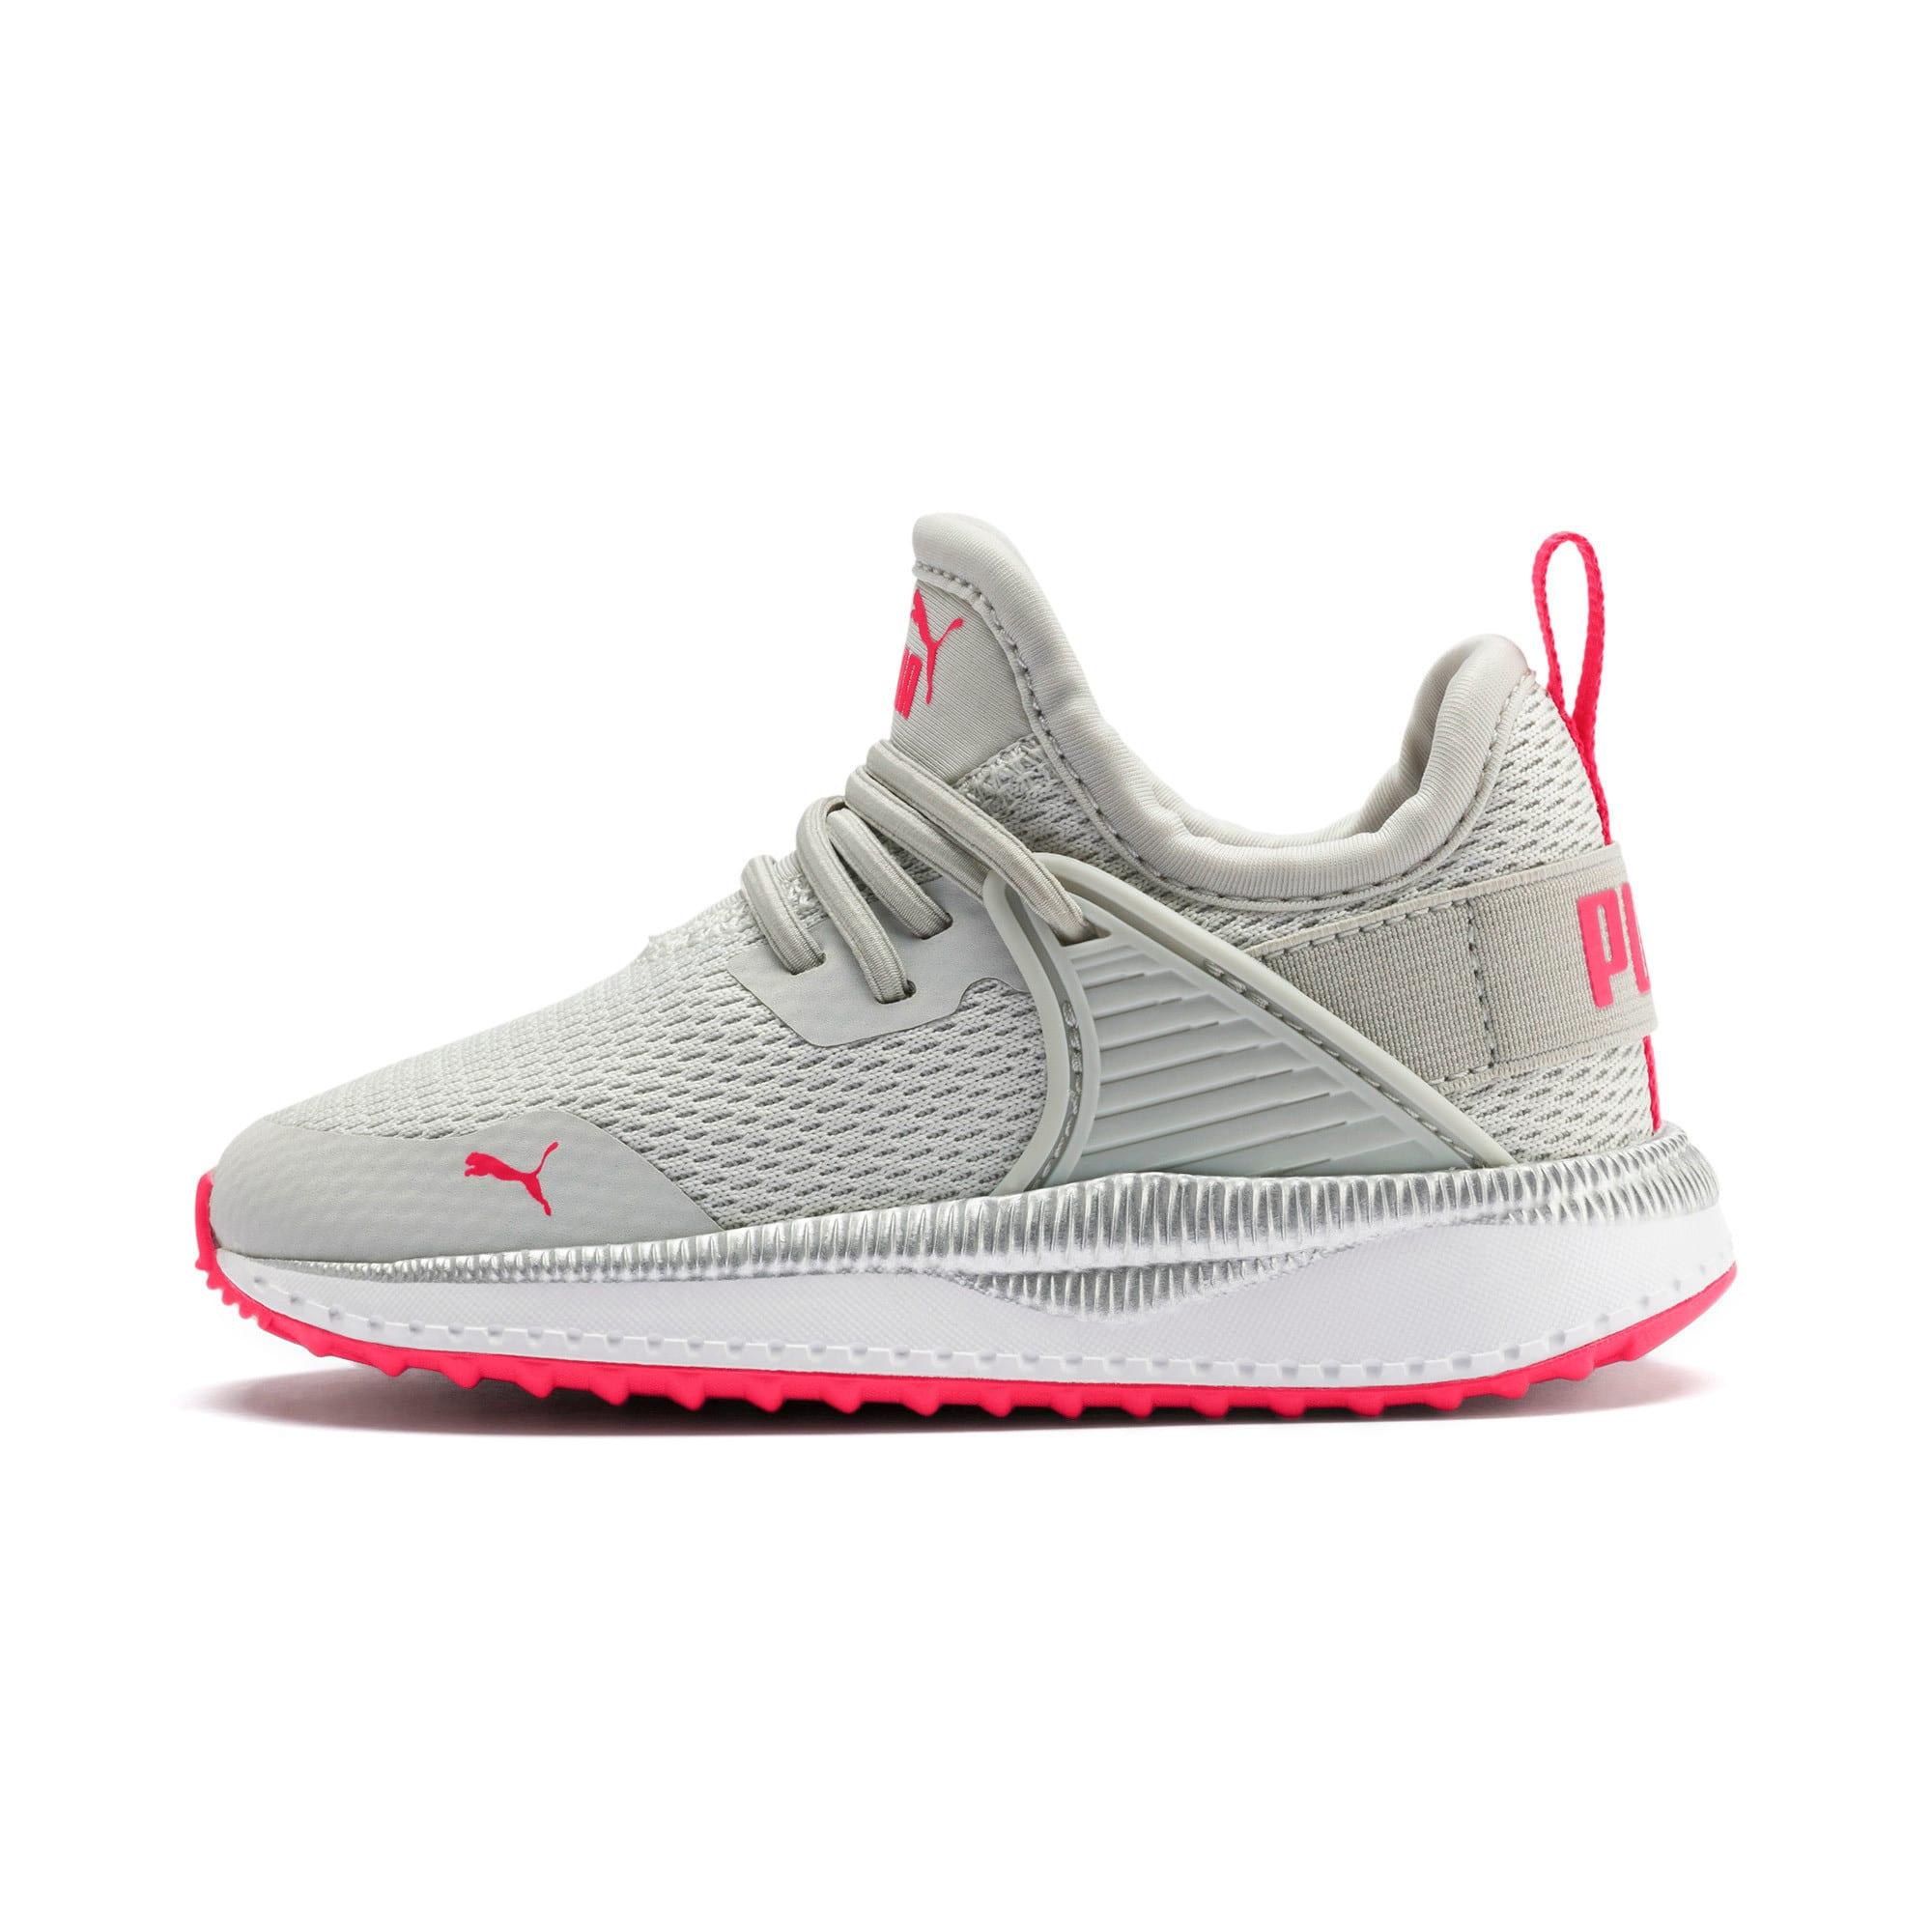 Thumbnail 1 of Pacer Next Cage Metallic Toddler Shoes, Gray Violet-Nrgy Rose, medium